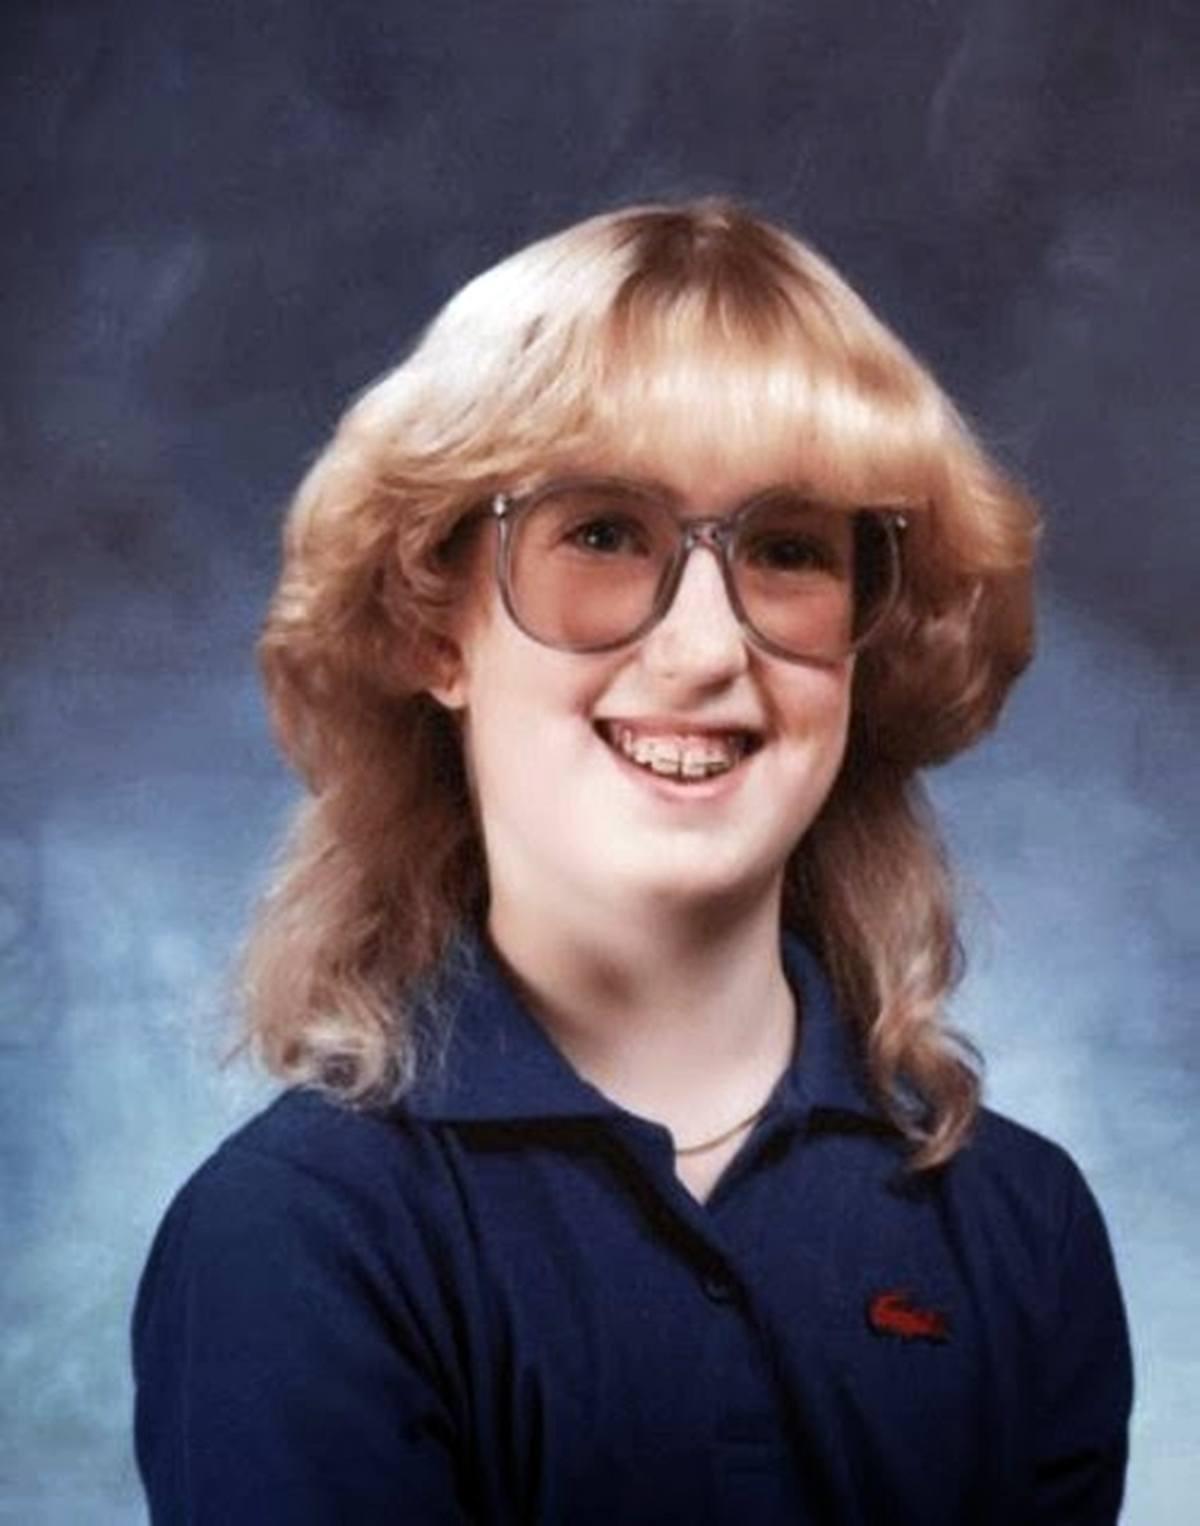 3 2 15 Hilariously Awkward Yearbook Photos